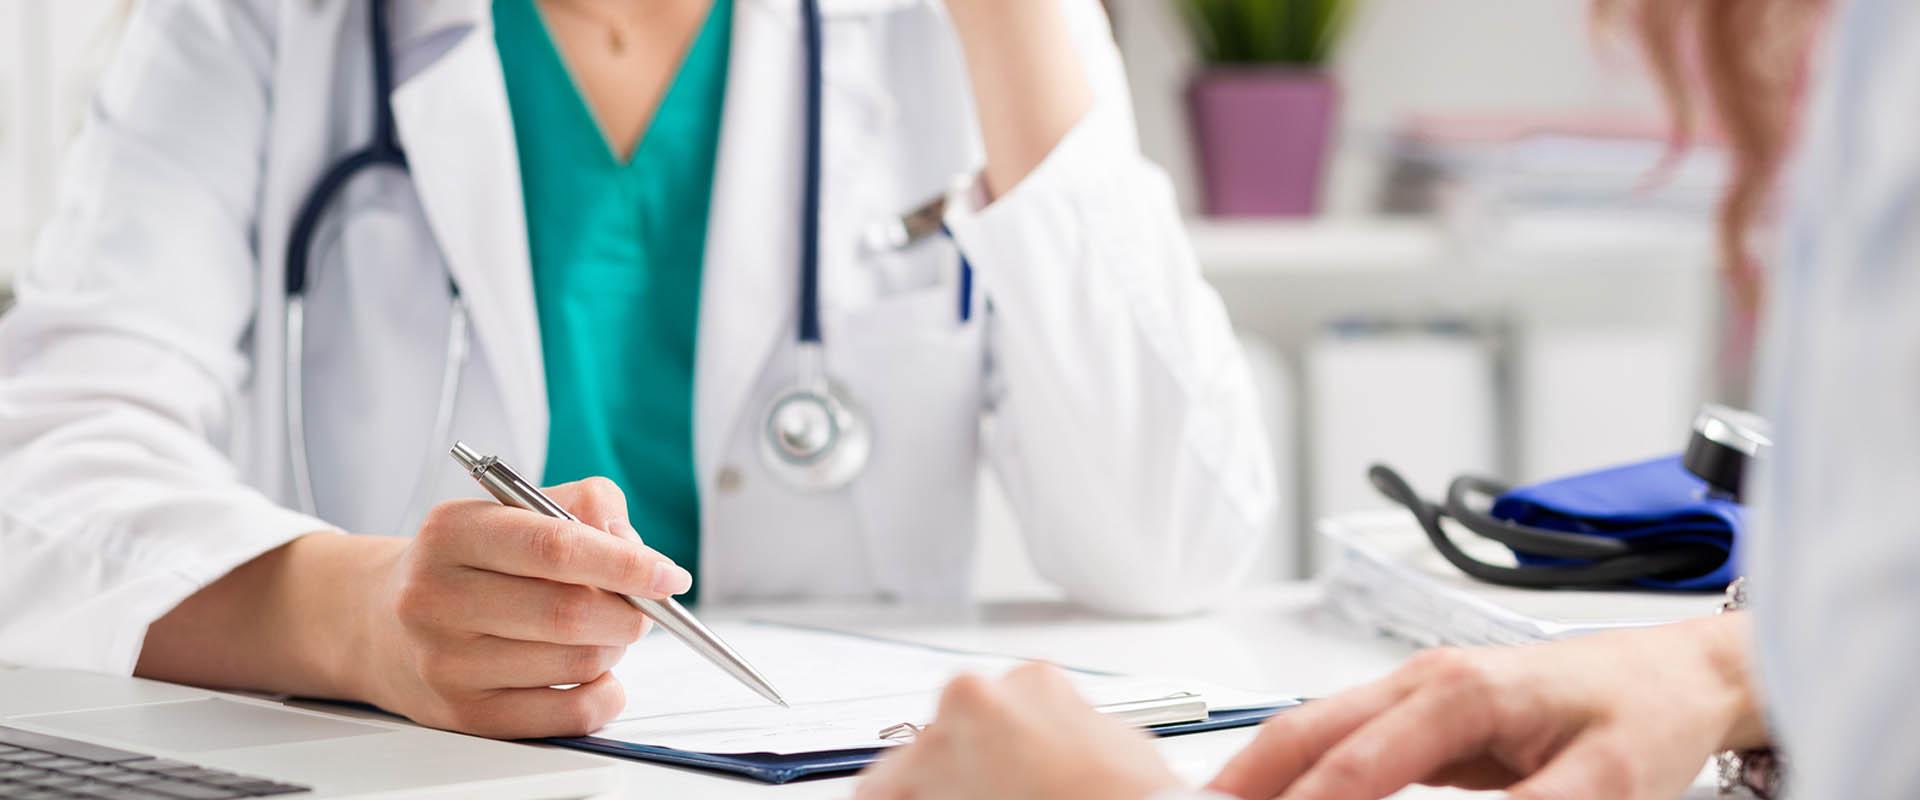 R Clinic